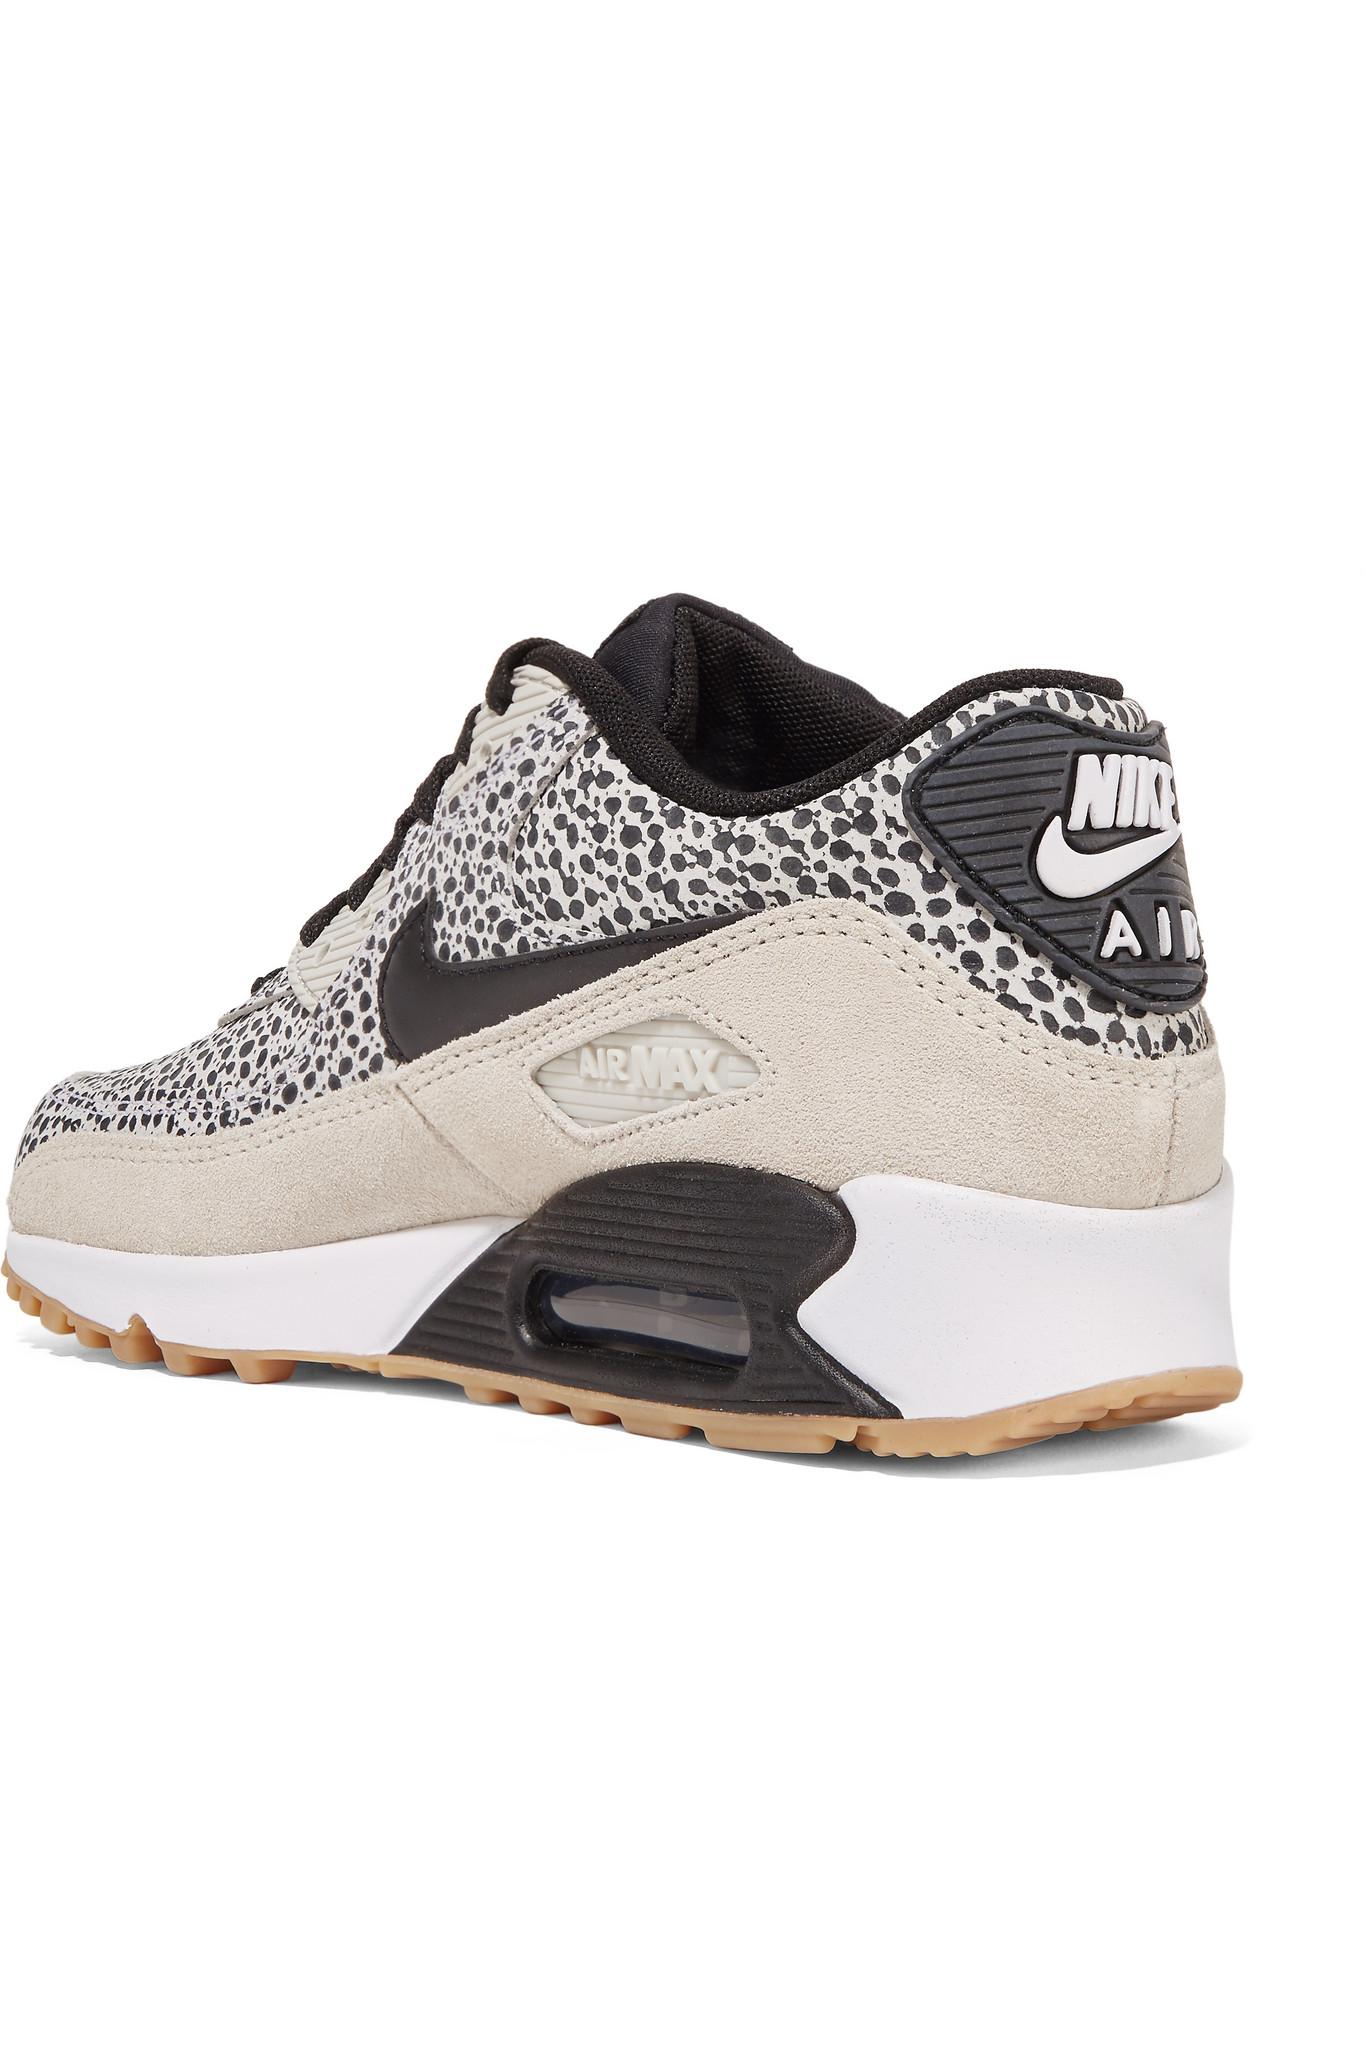 Nike Chaussures De Sport Haut De Gamme En Cuir Air Max